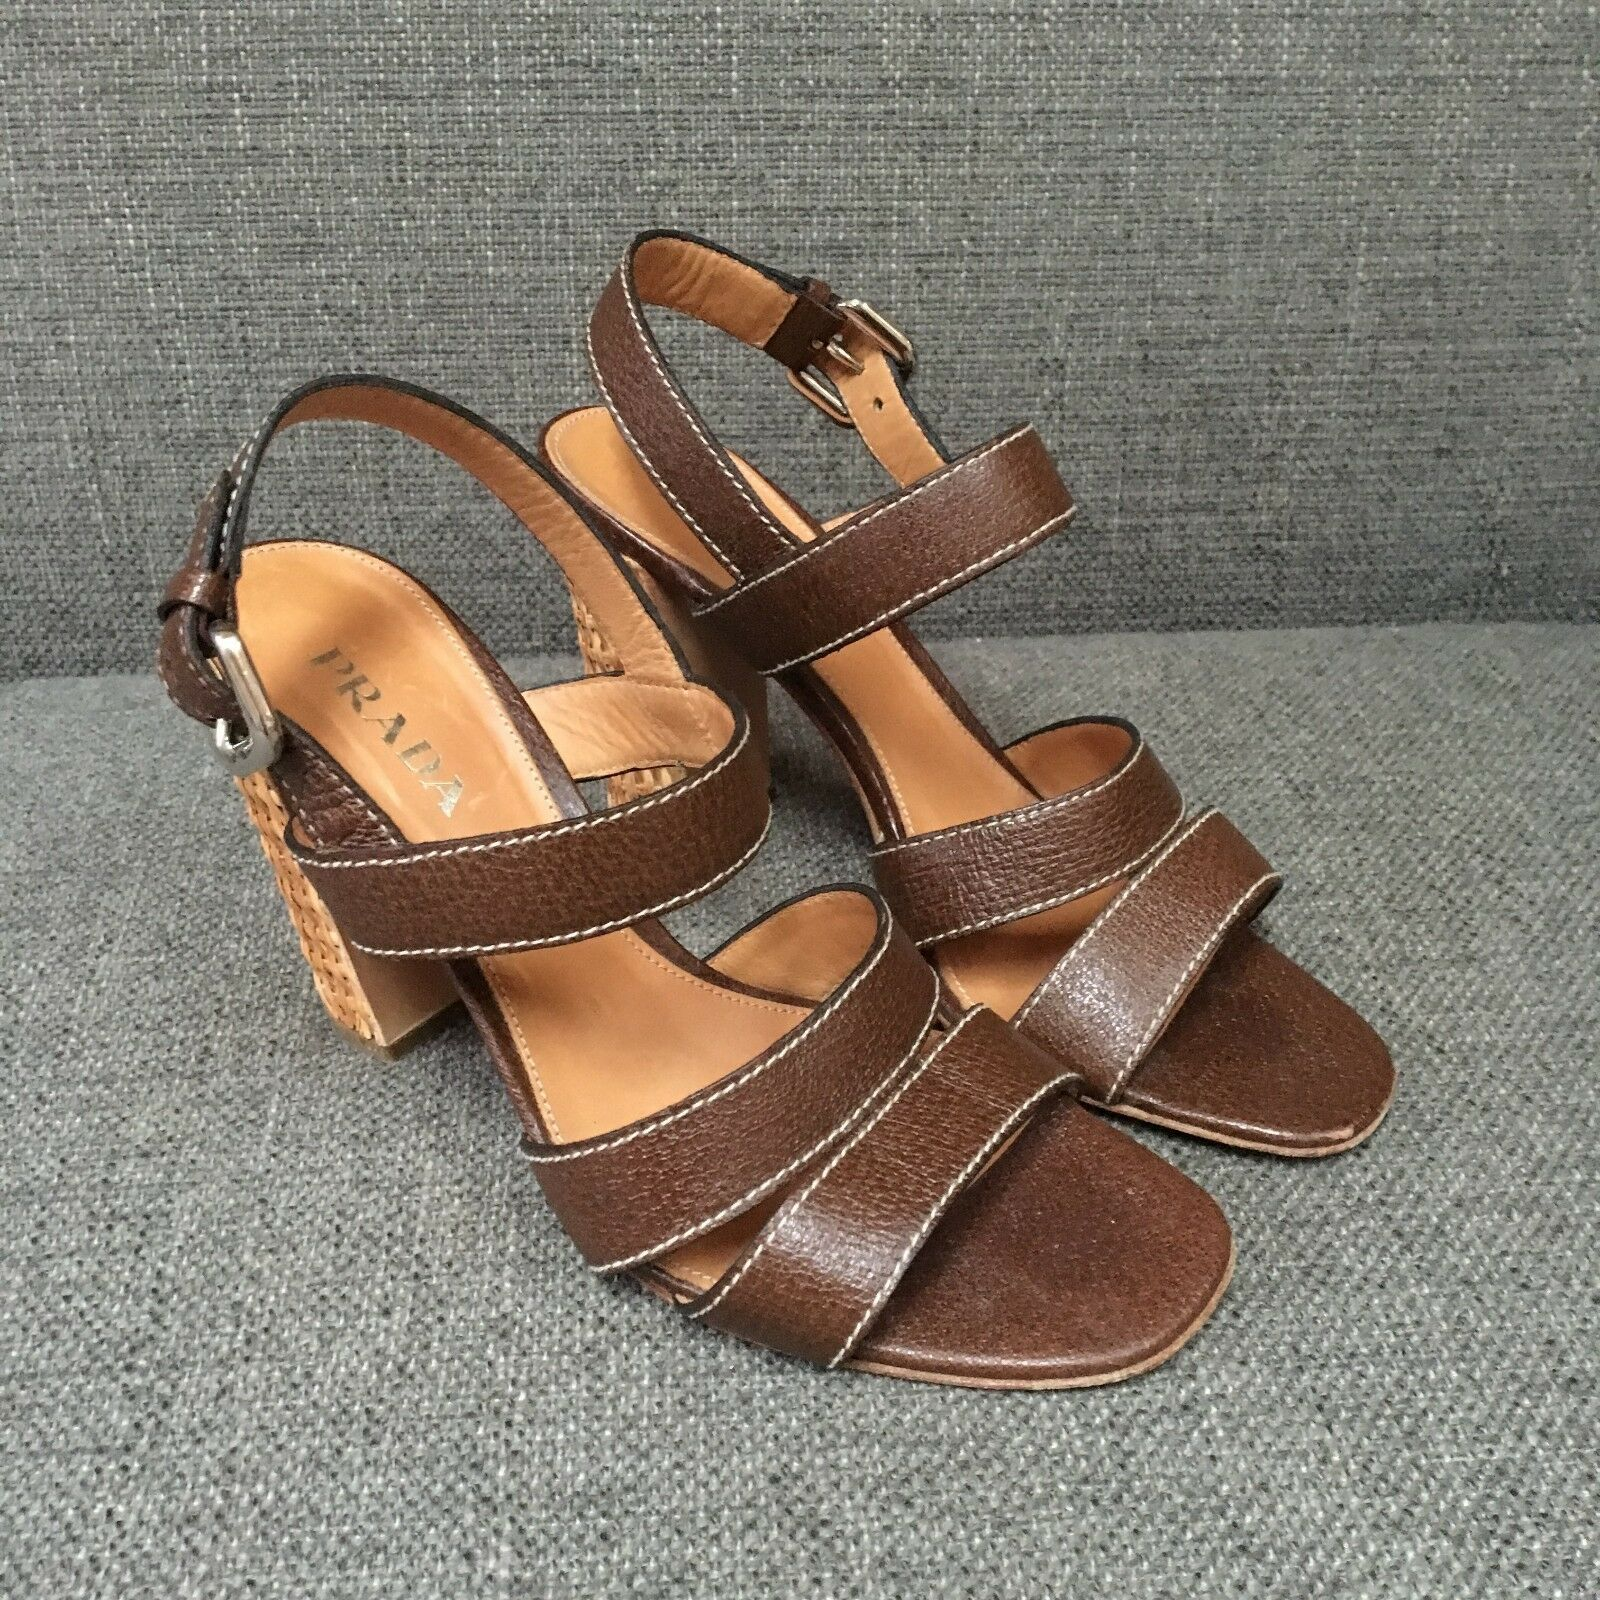 Prada Brown Leather Sandal Straw Raffia Block Heel Simple Slingback 38 7.5